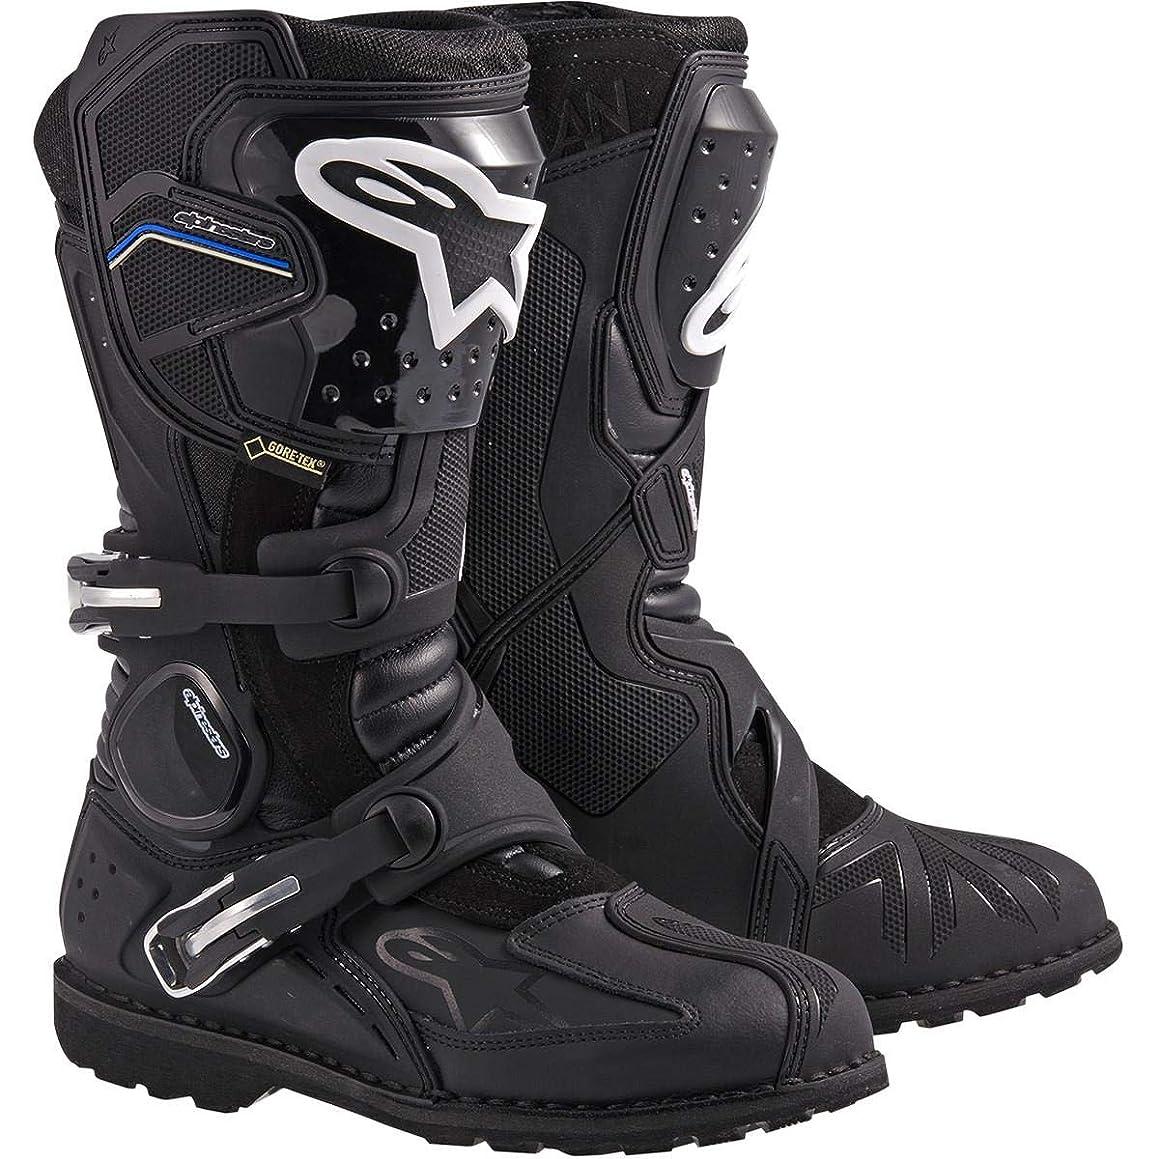 Alpinestars Toucan Gore-Tex Men's Weatherproof Motorcycle Touring Boots (Black, US Size 11)